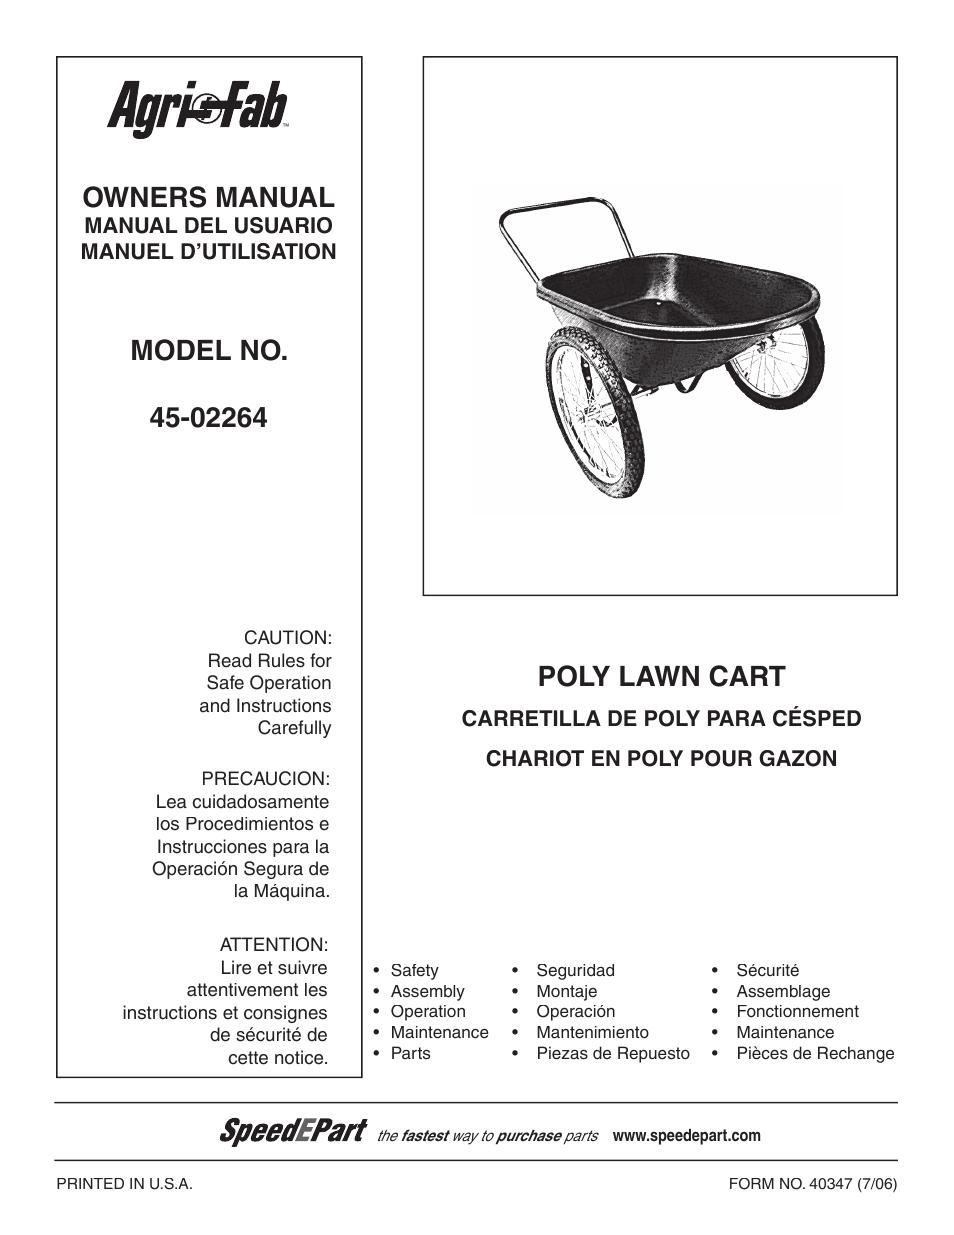 agri fab poly lawn cart 45 02264 user manual 8 pages original mode rh manualsdir com Agri-Fab Lawn Sweeper Parts Agri-Fab Mow-N-Vac